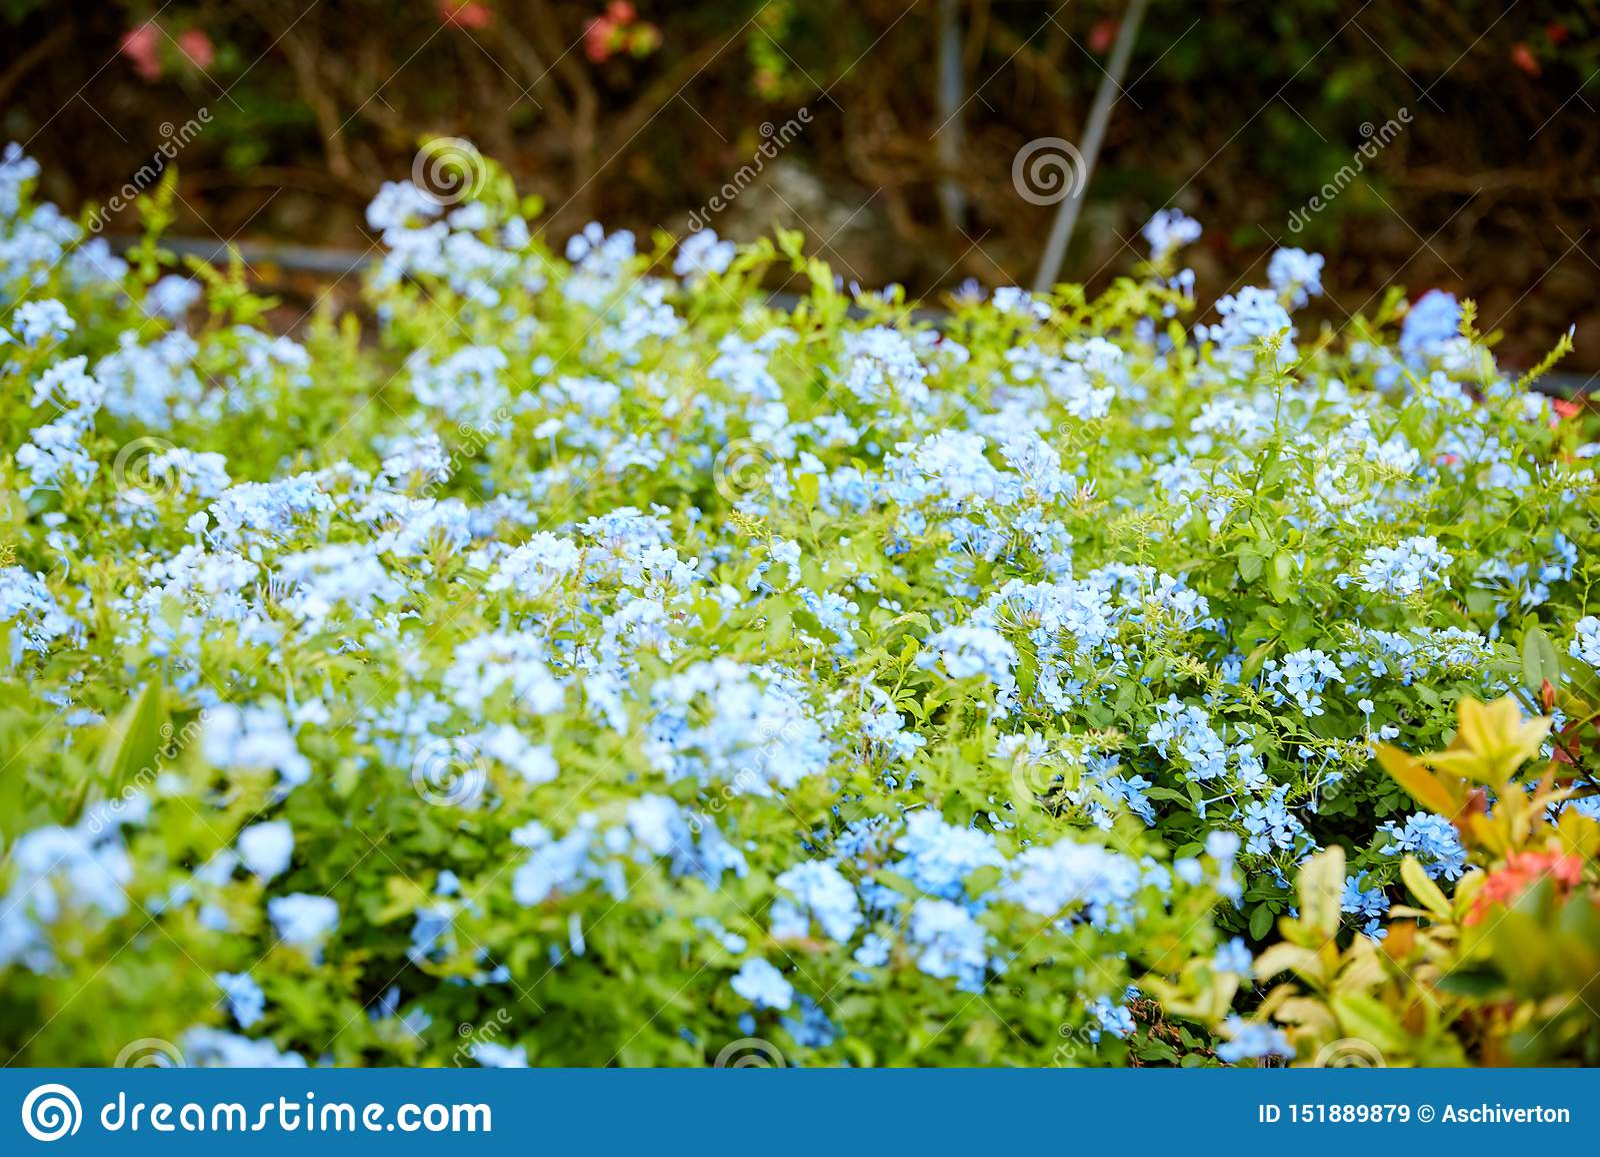 Blå blyerts blom- Bush i tropisk trädgård